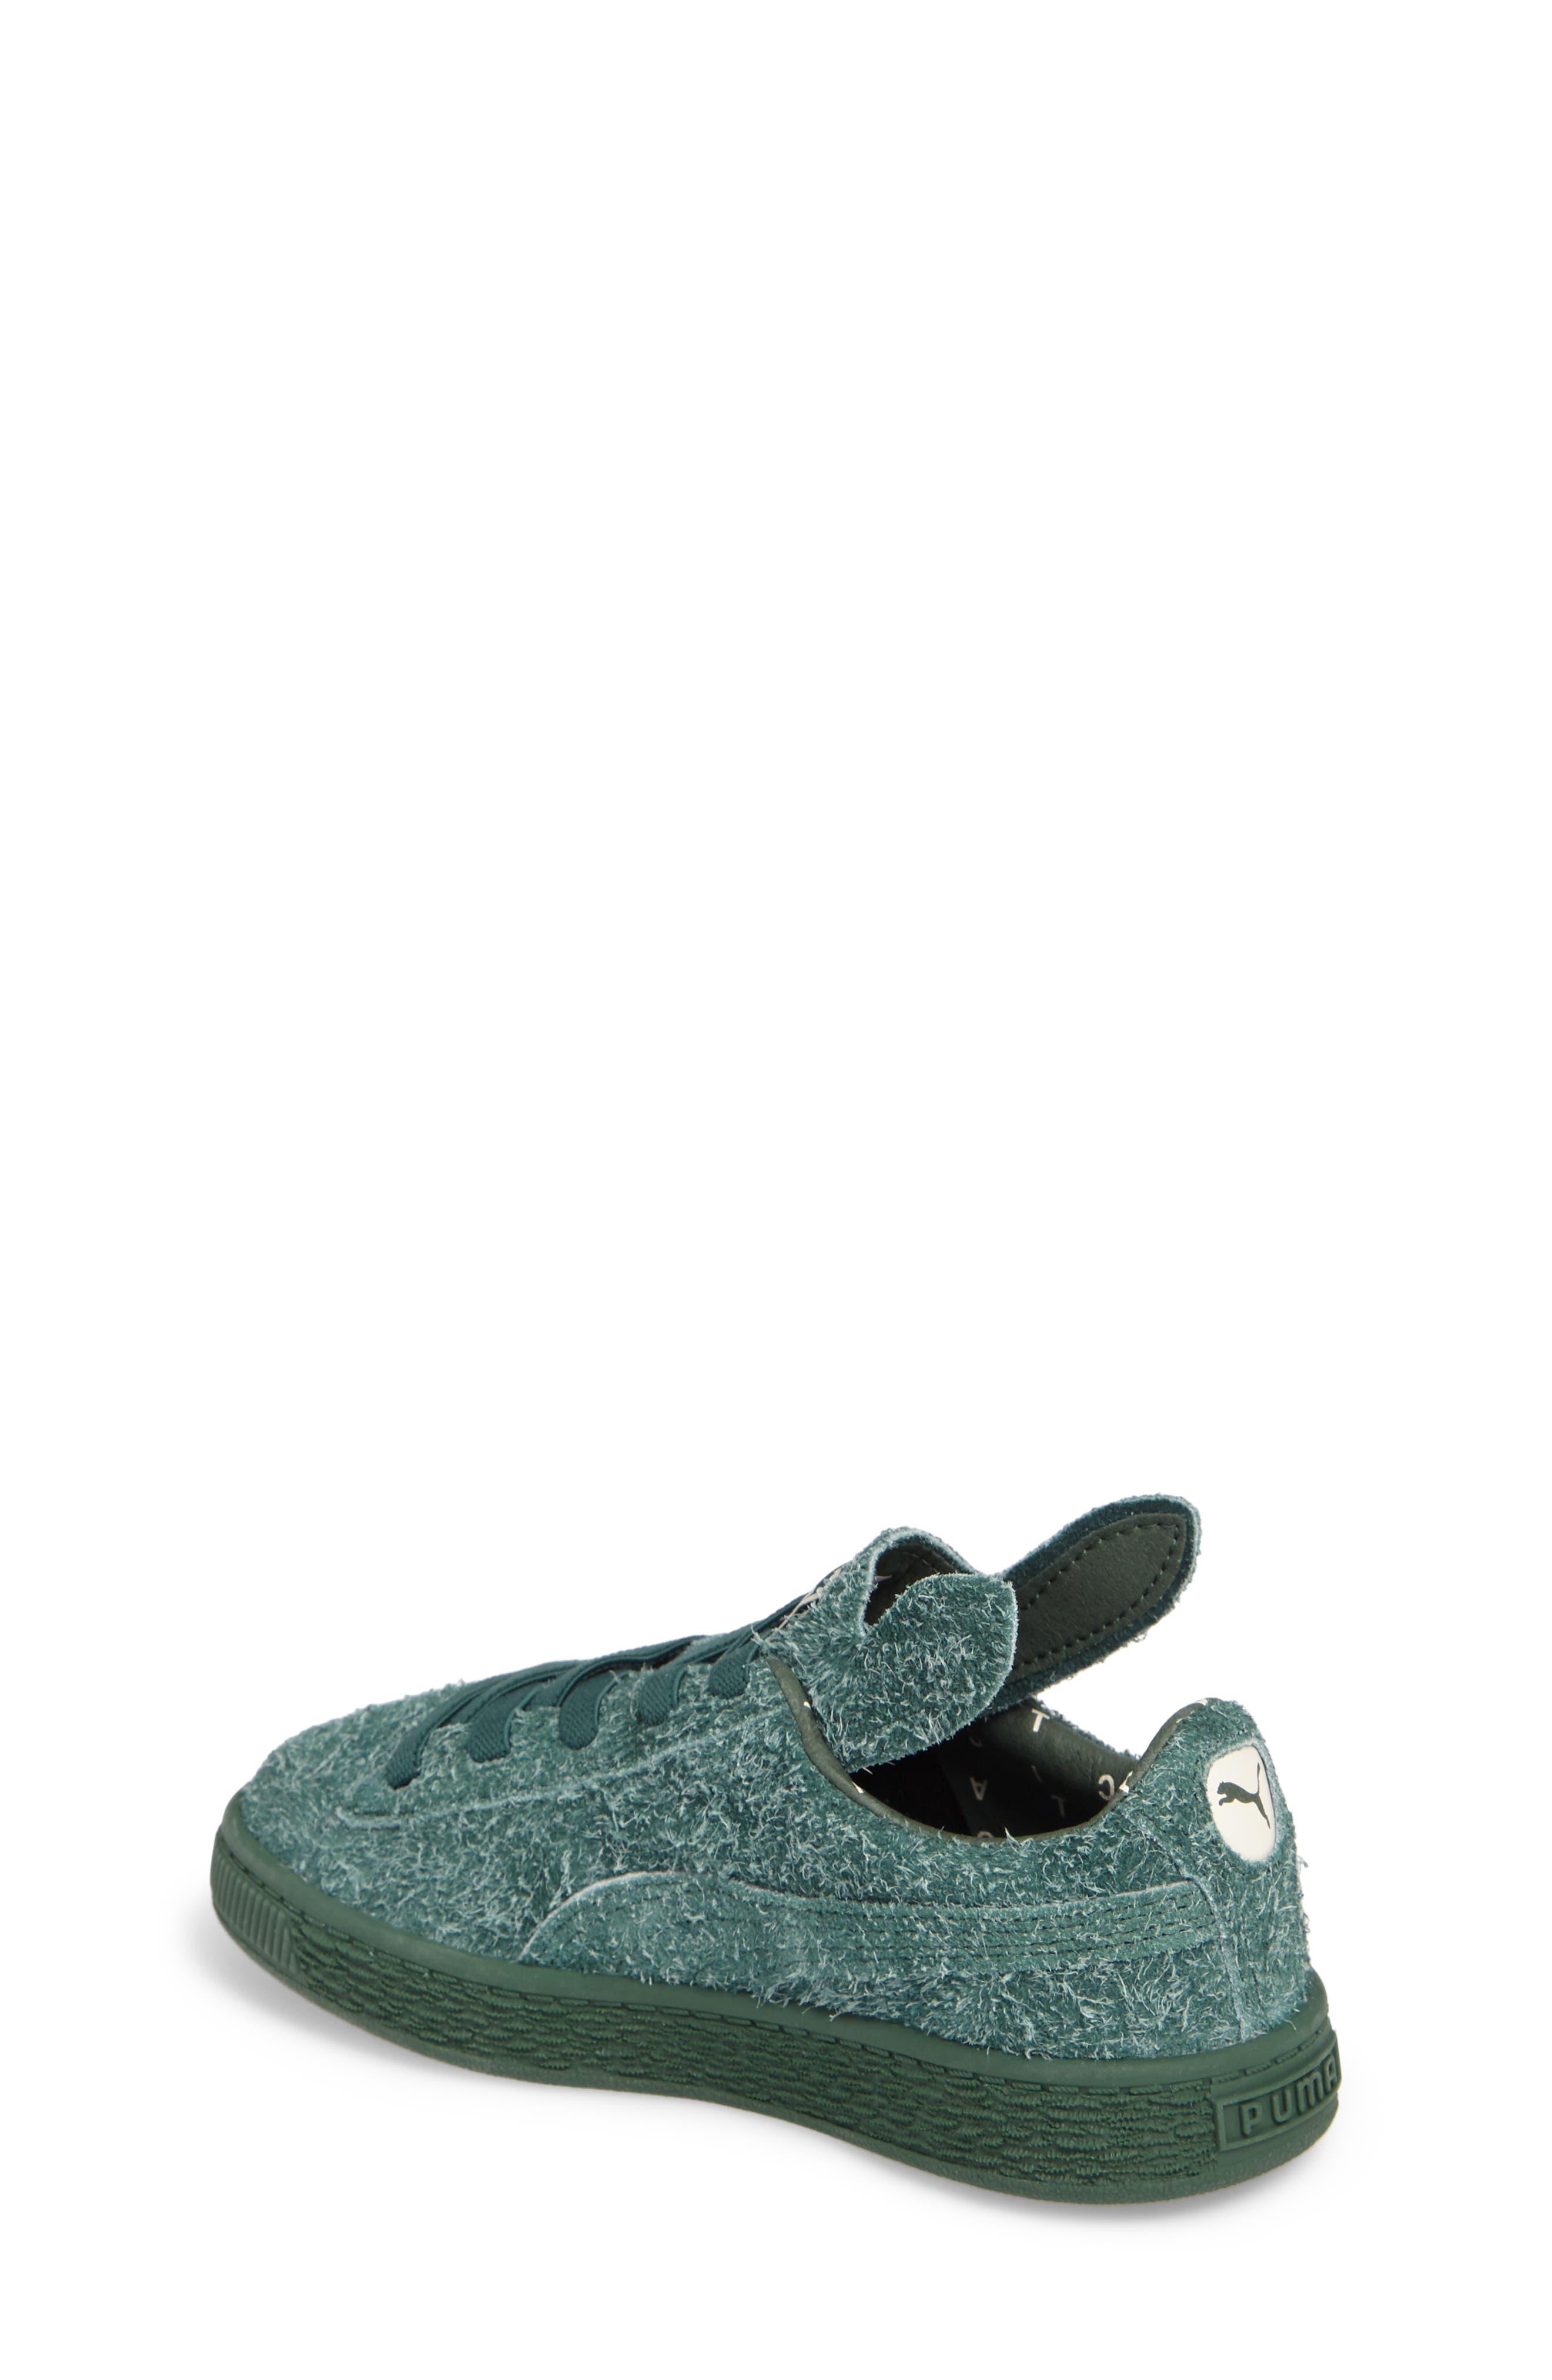 x tinycottons Basket Furry Sneaker,                             Alternate thumbnail 2, color,                             300